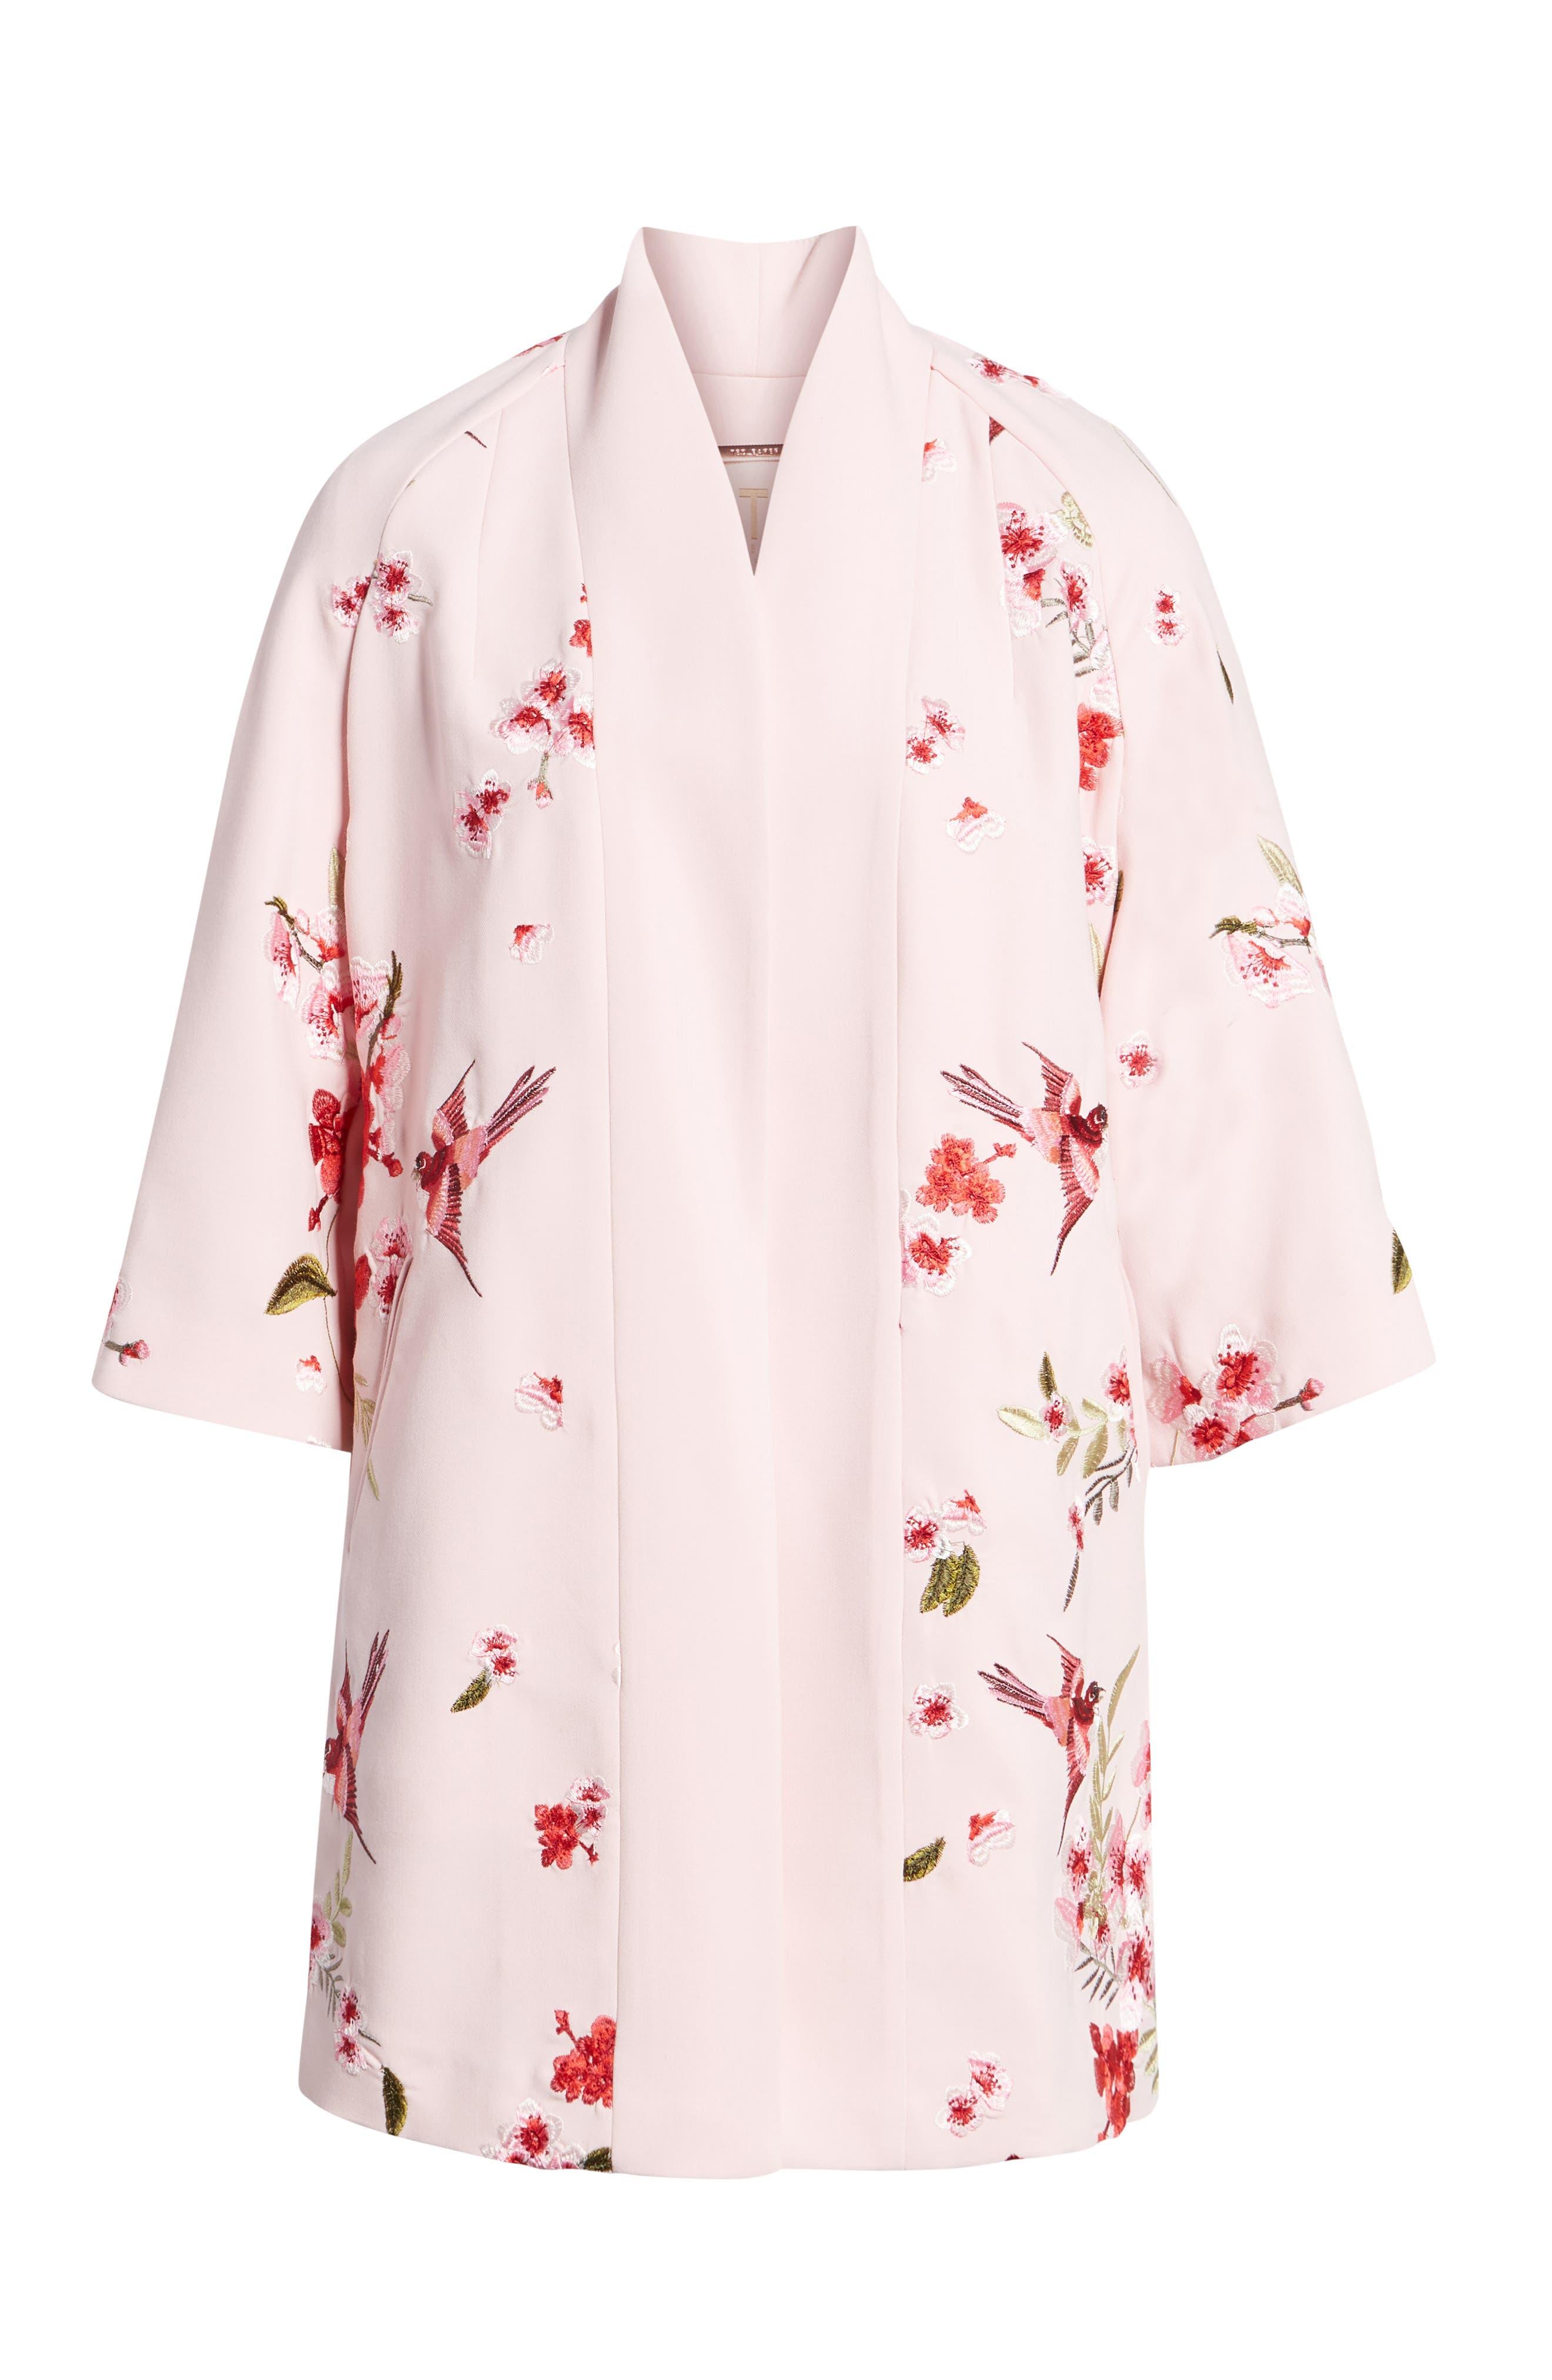 Bird & Blossom Spring Kimono,                             Alternate thumbnail 6, color,